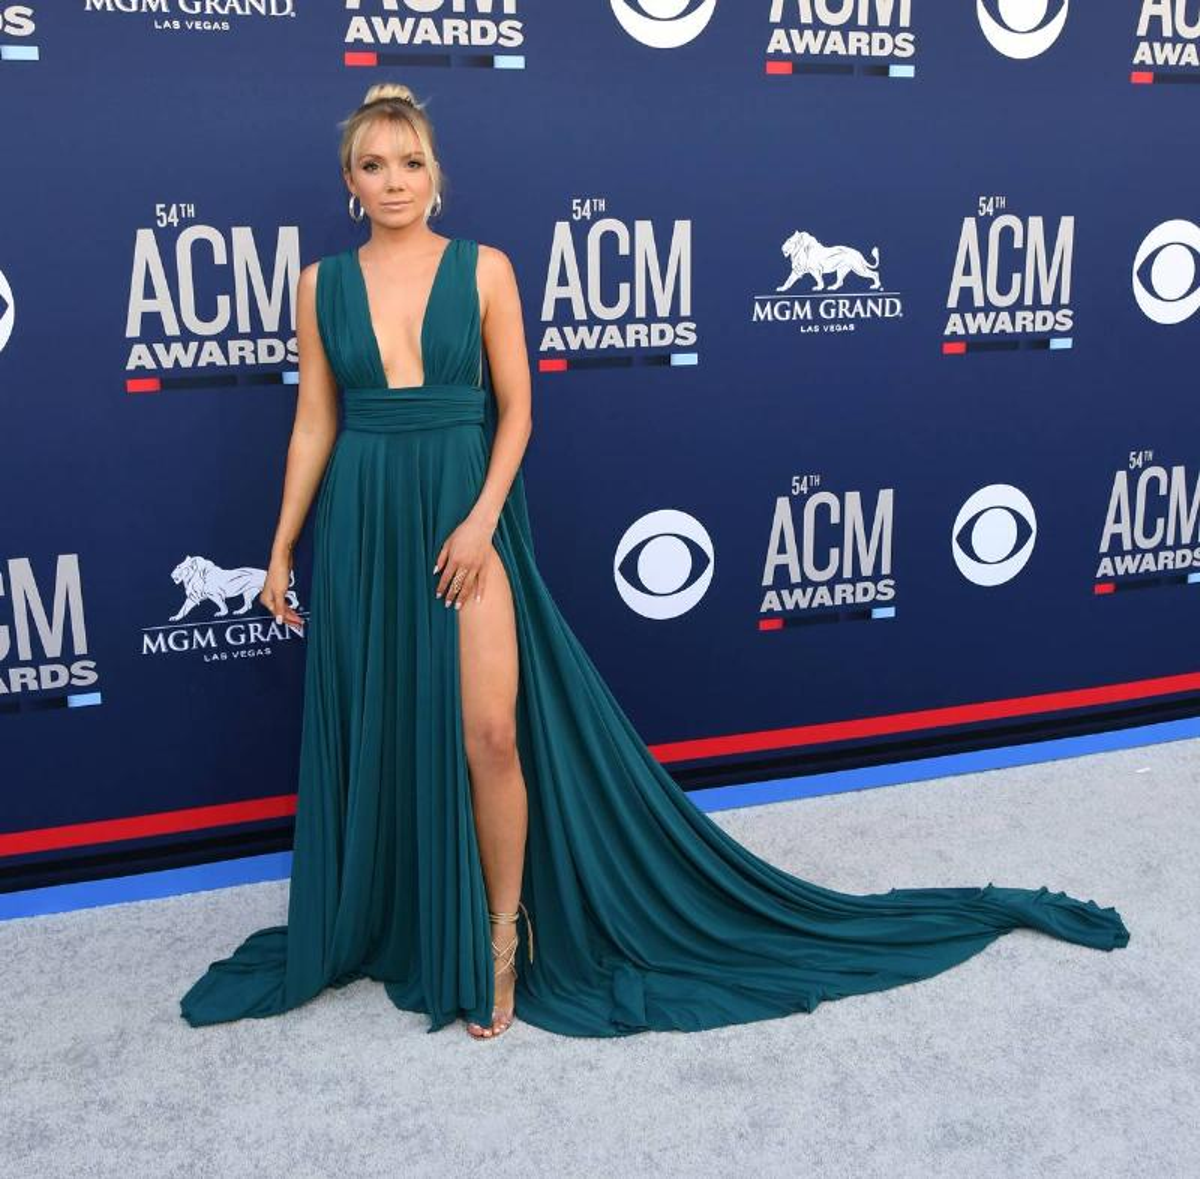 Danielle Bradbery appears on the ACM 2019 red carpet.